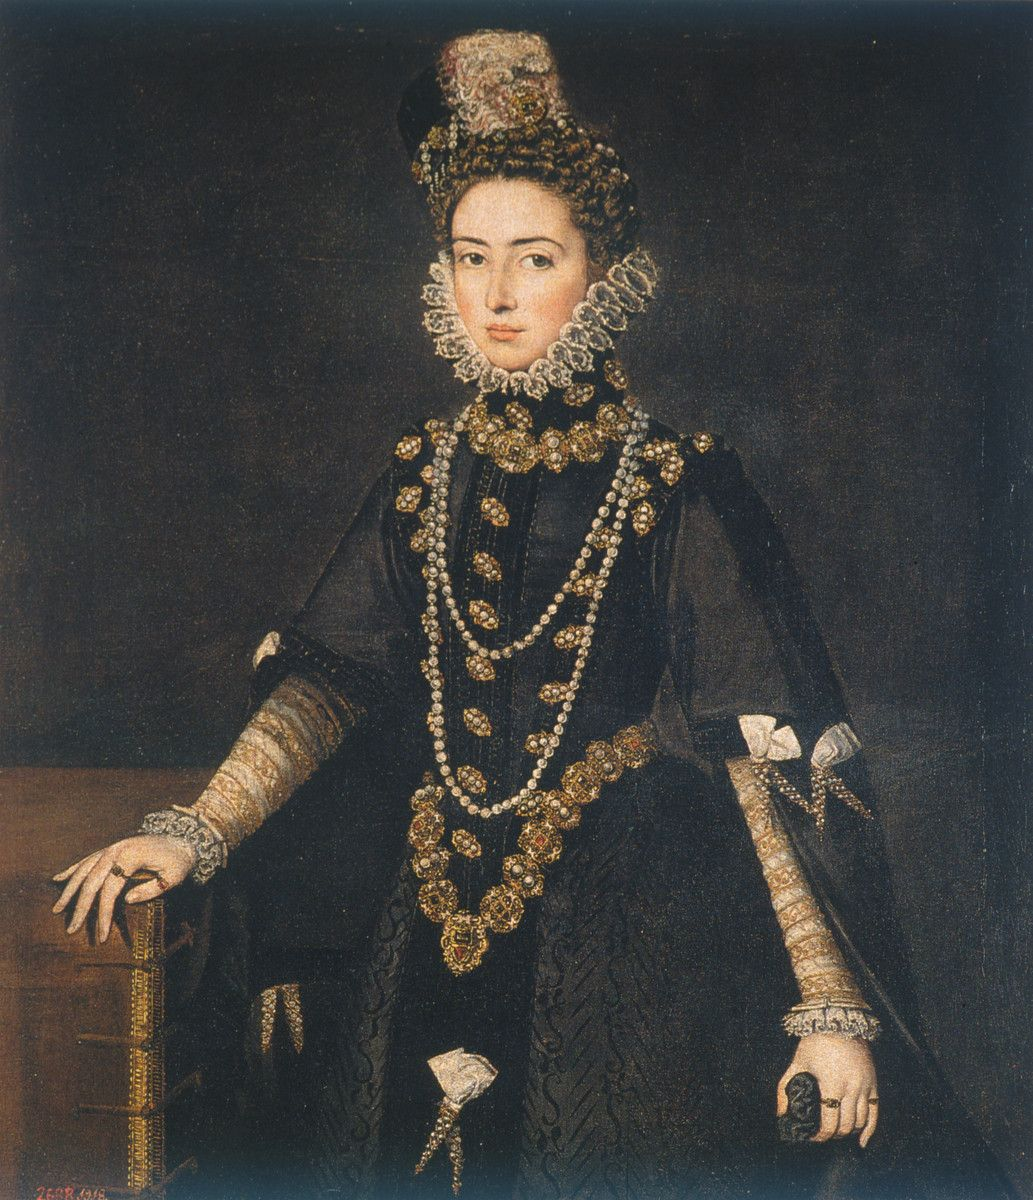 La Dinastía Habsburgo Españoles Foros Realeza Renaissance Fashion Renaissance Portraits 16th Century Fashion